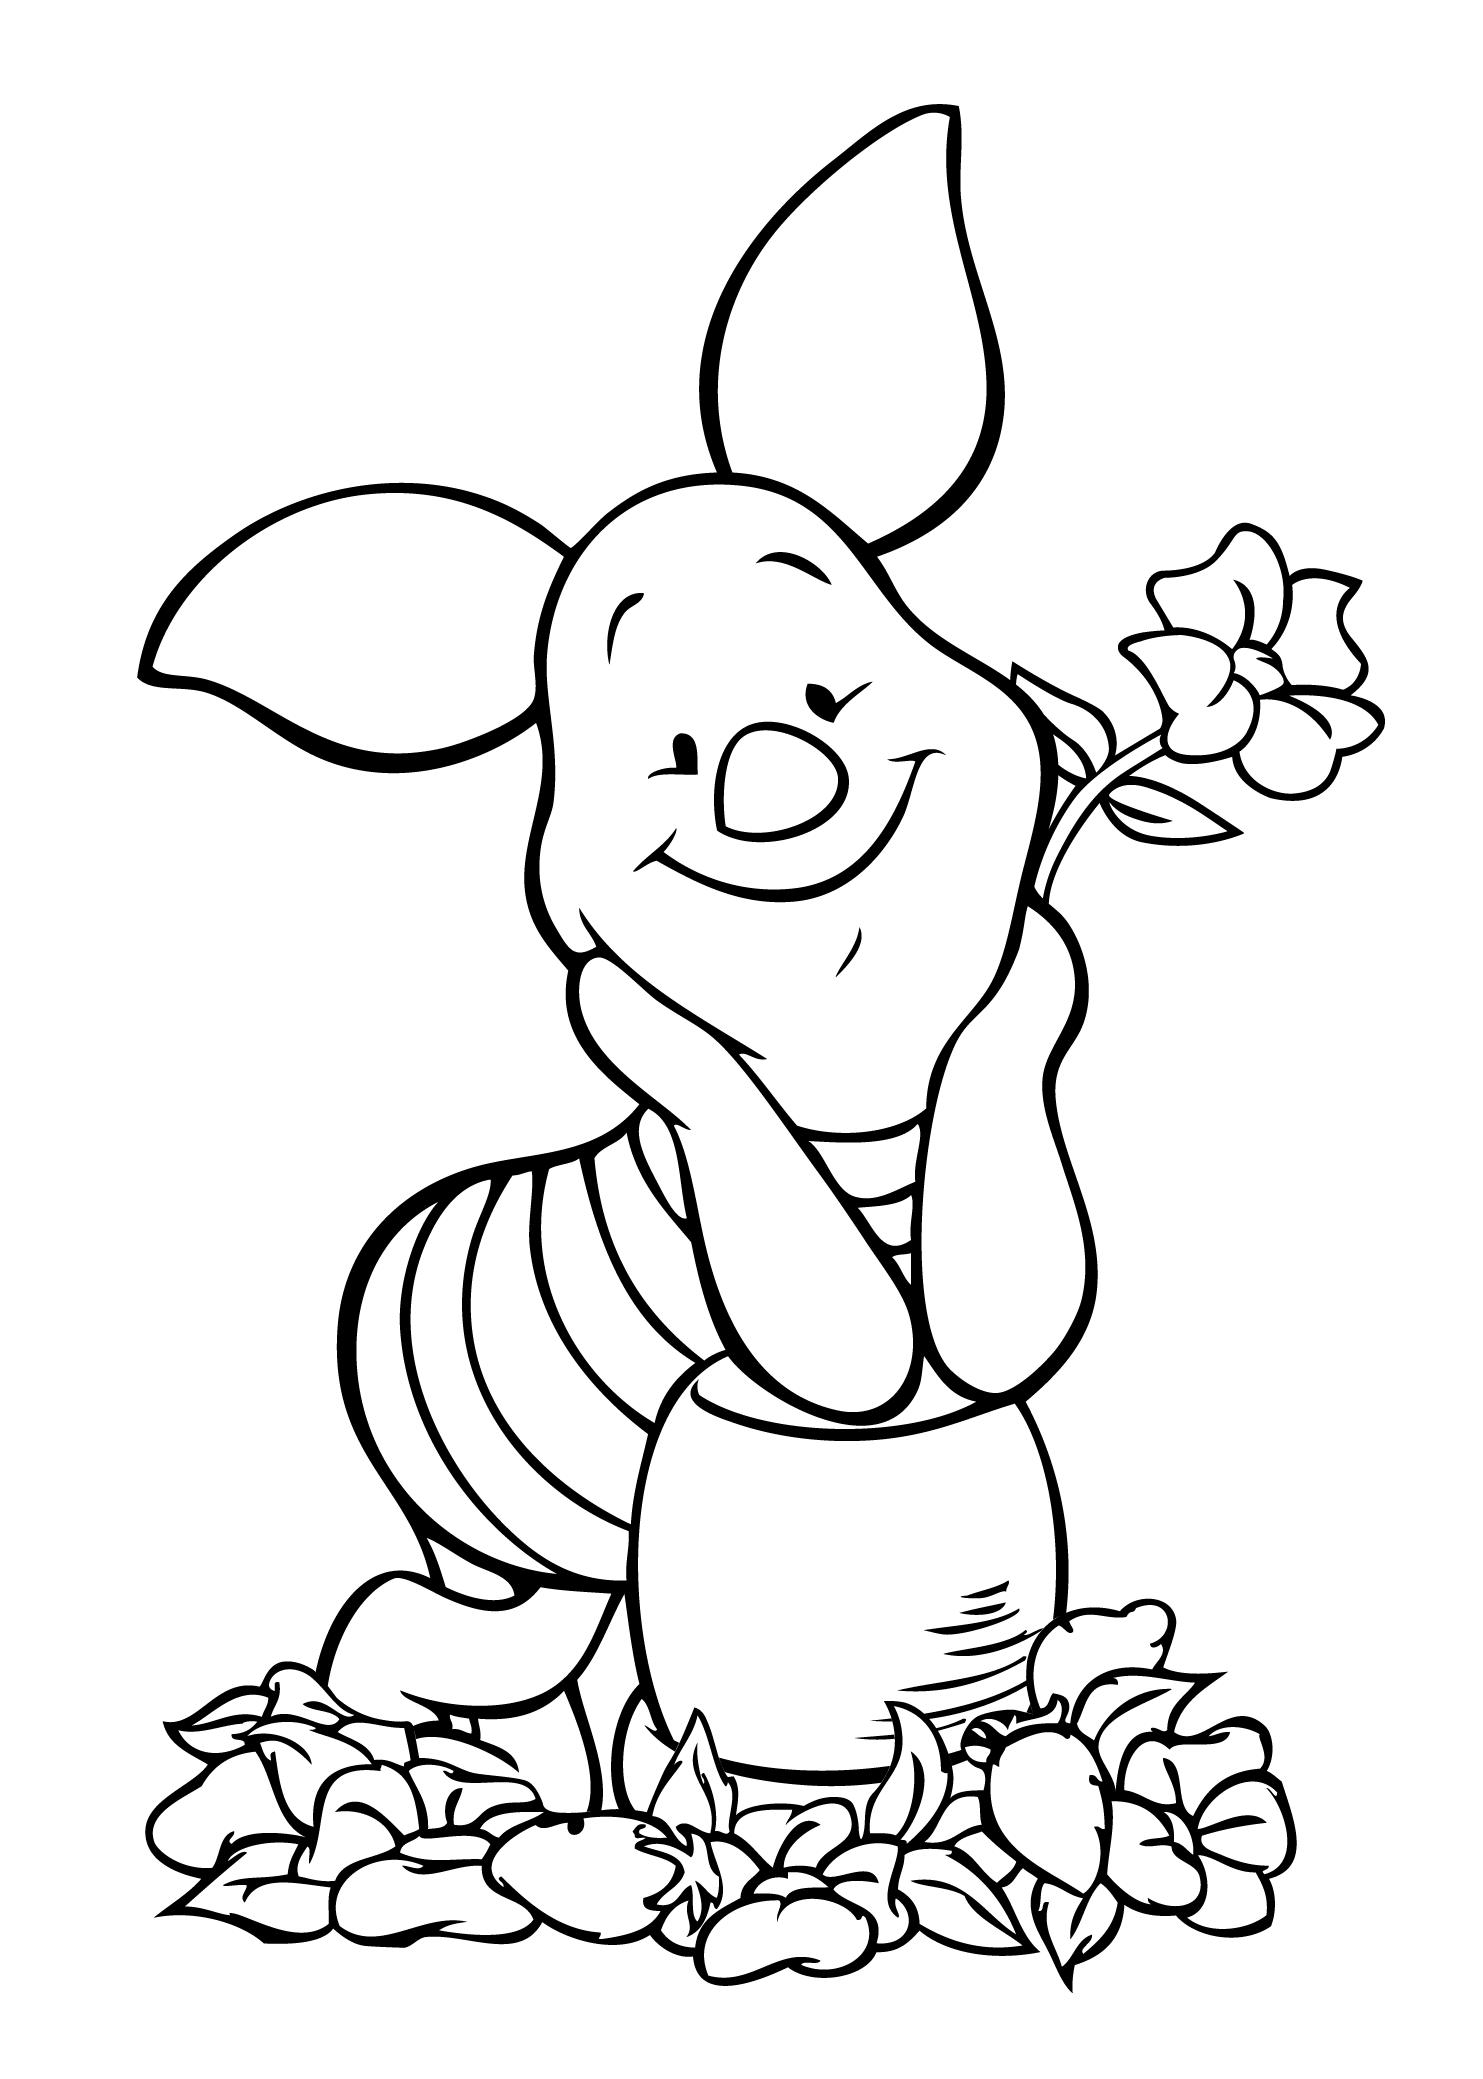 winnie pooh piglet coloring page  ausmalbilder disney